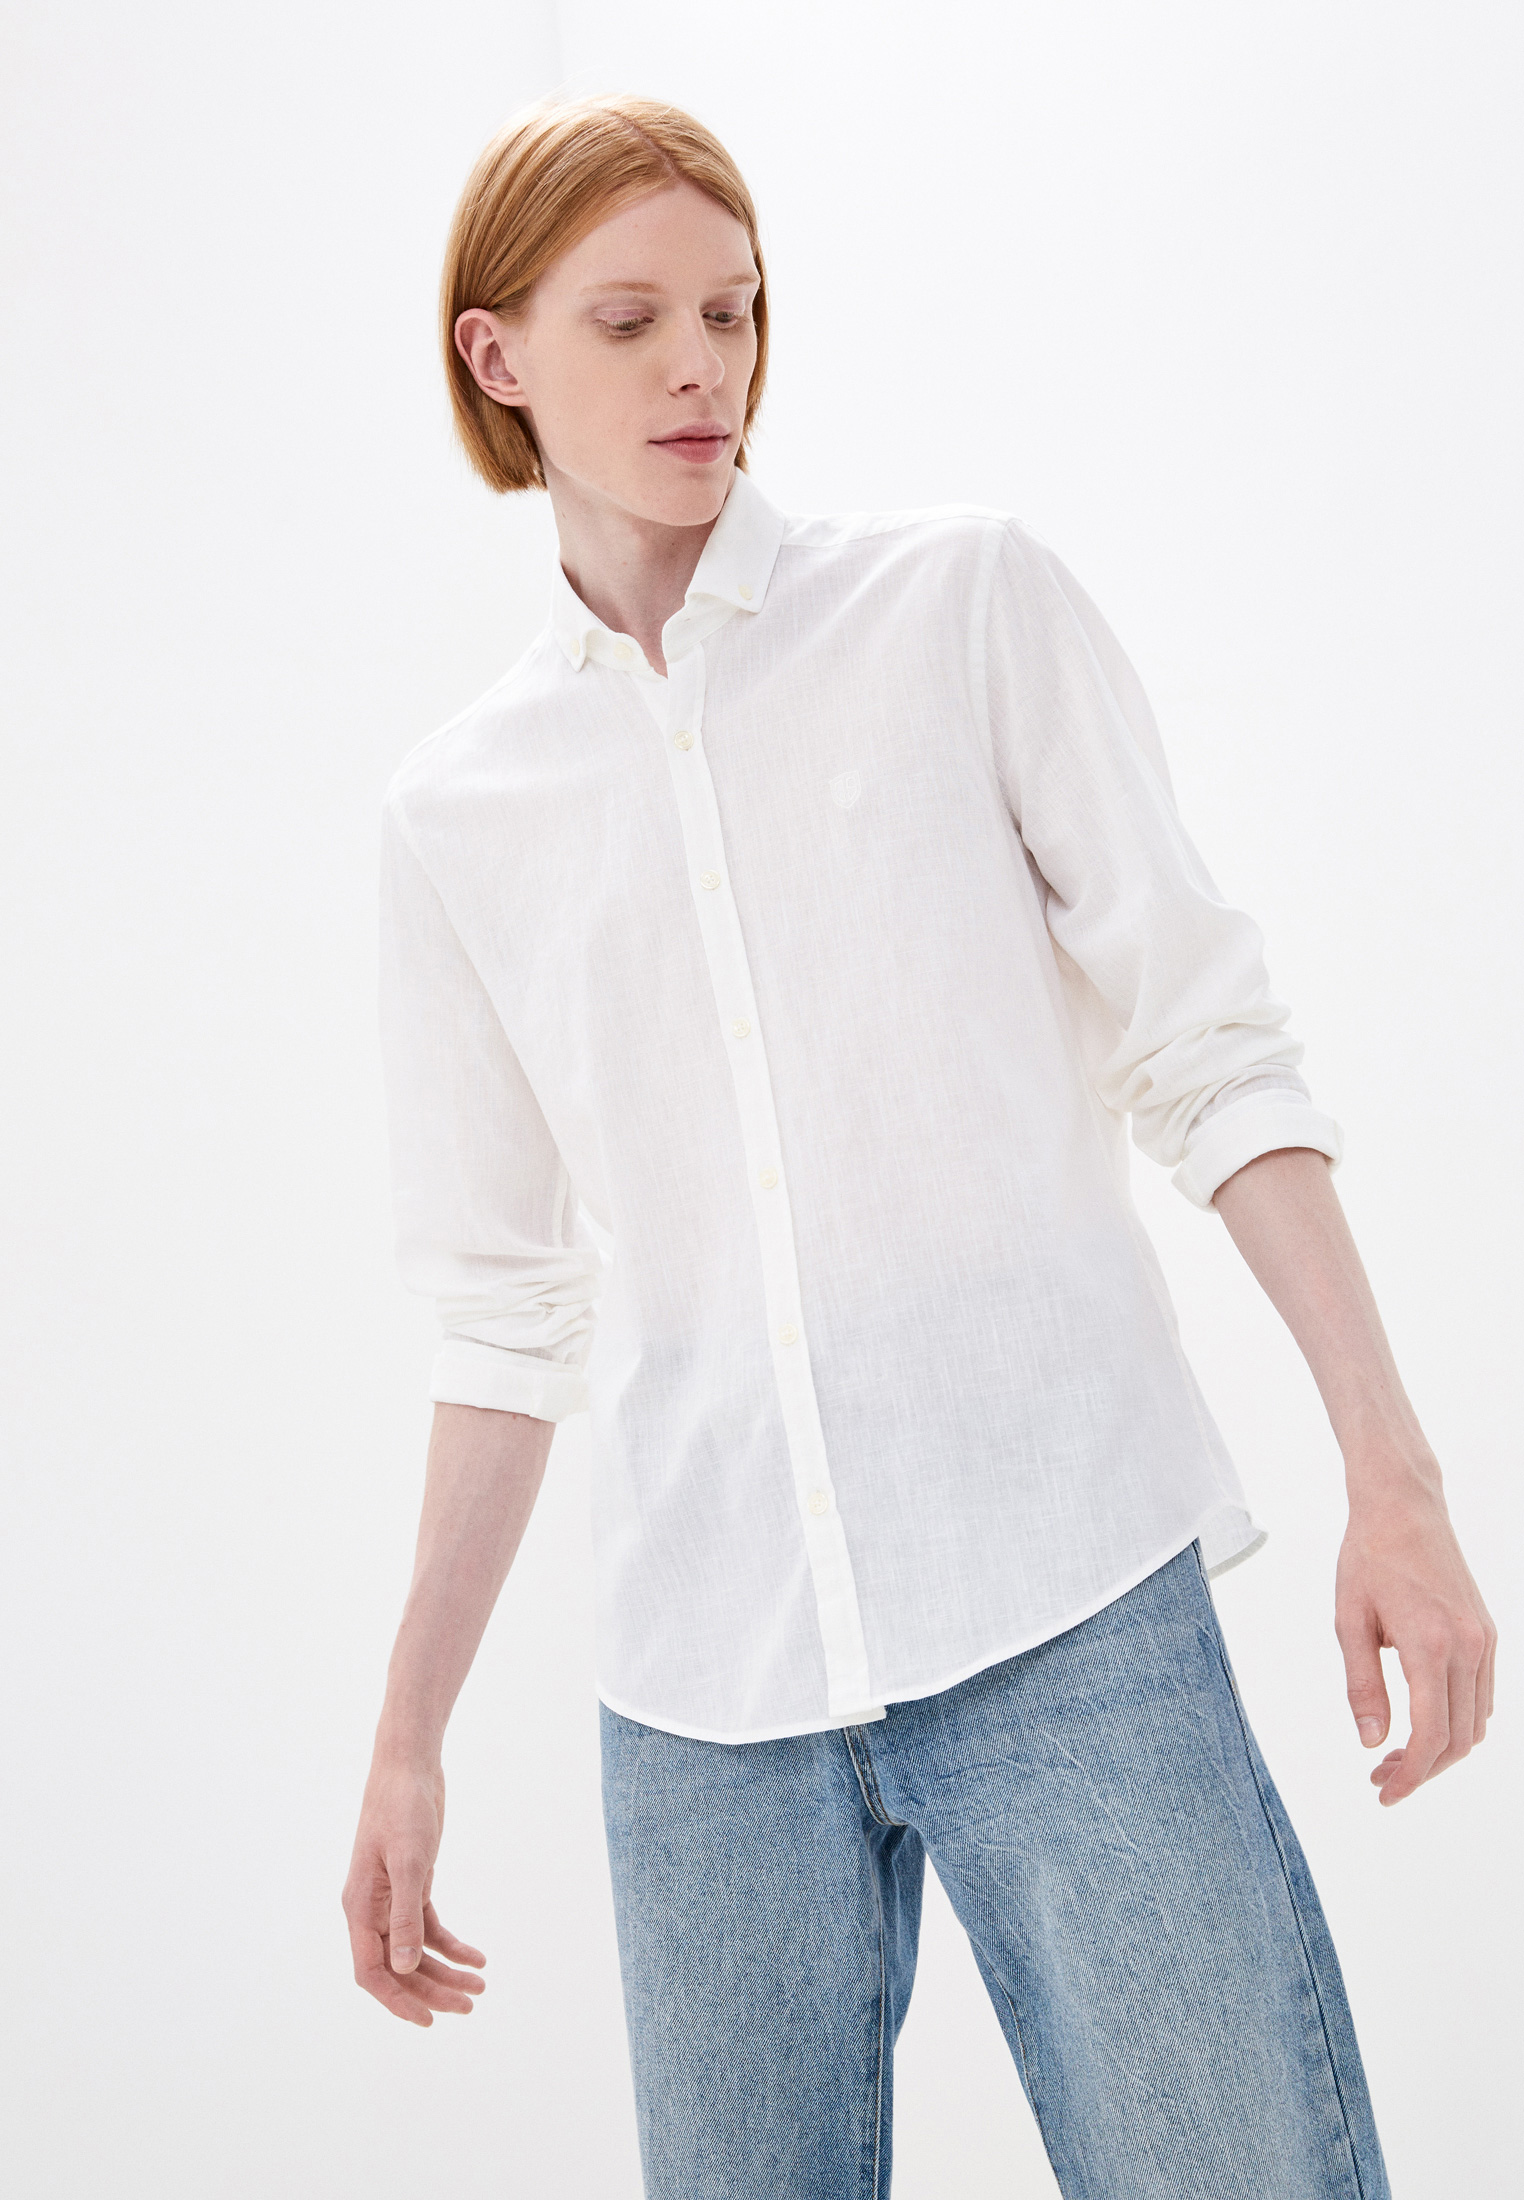 Рубашка с длинным рукавом JIMMY SANDERS (Джимми Сандерс) 20S JSMSHT0029